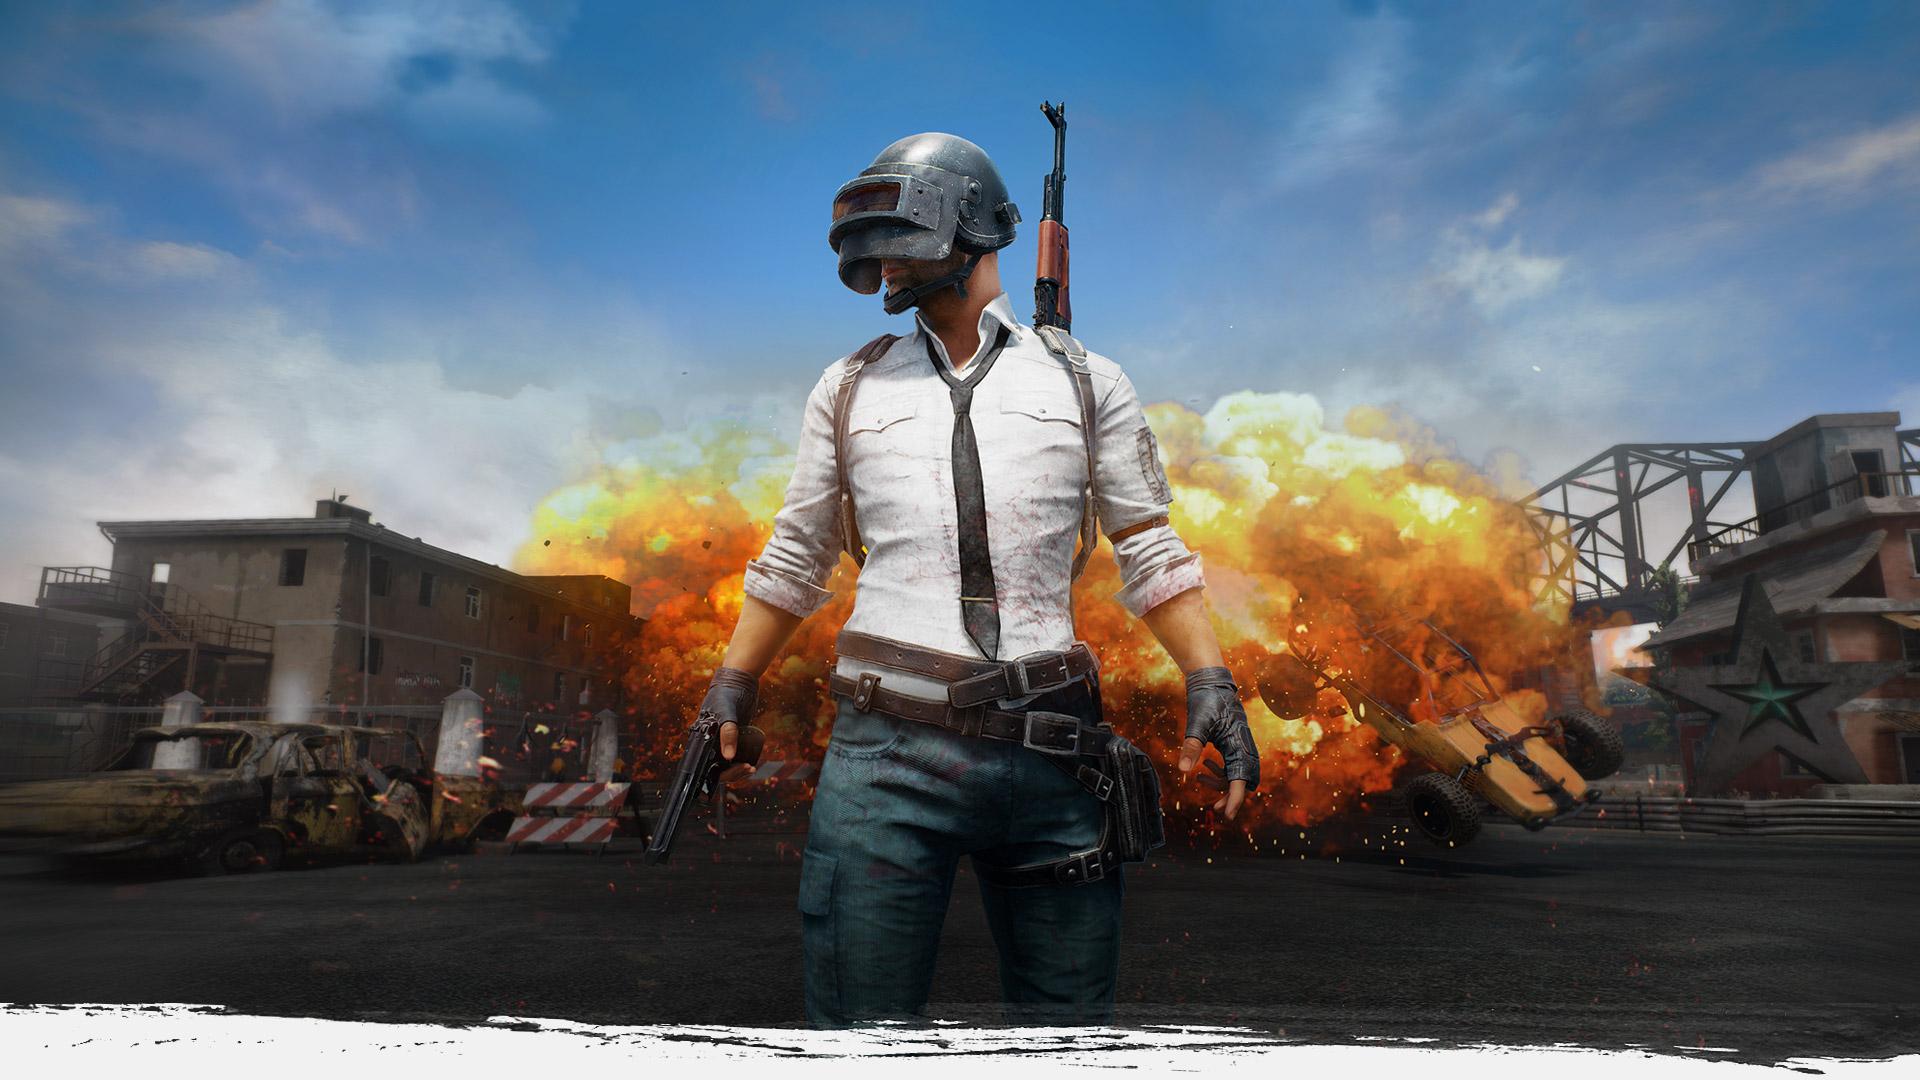 Авторы Playerunknown's Battlegrounds отчитались опродажах игры